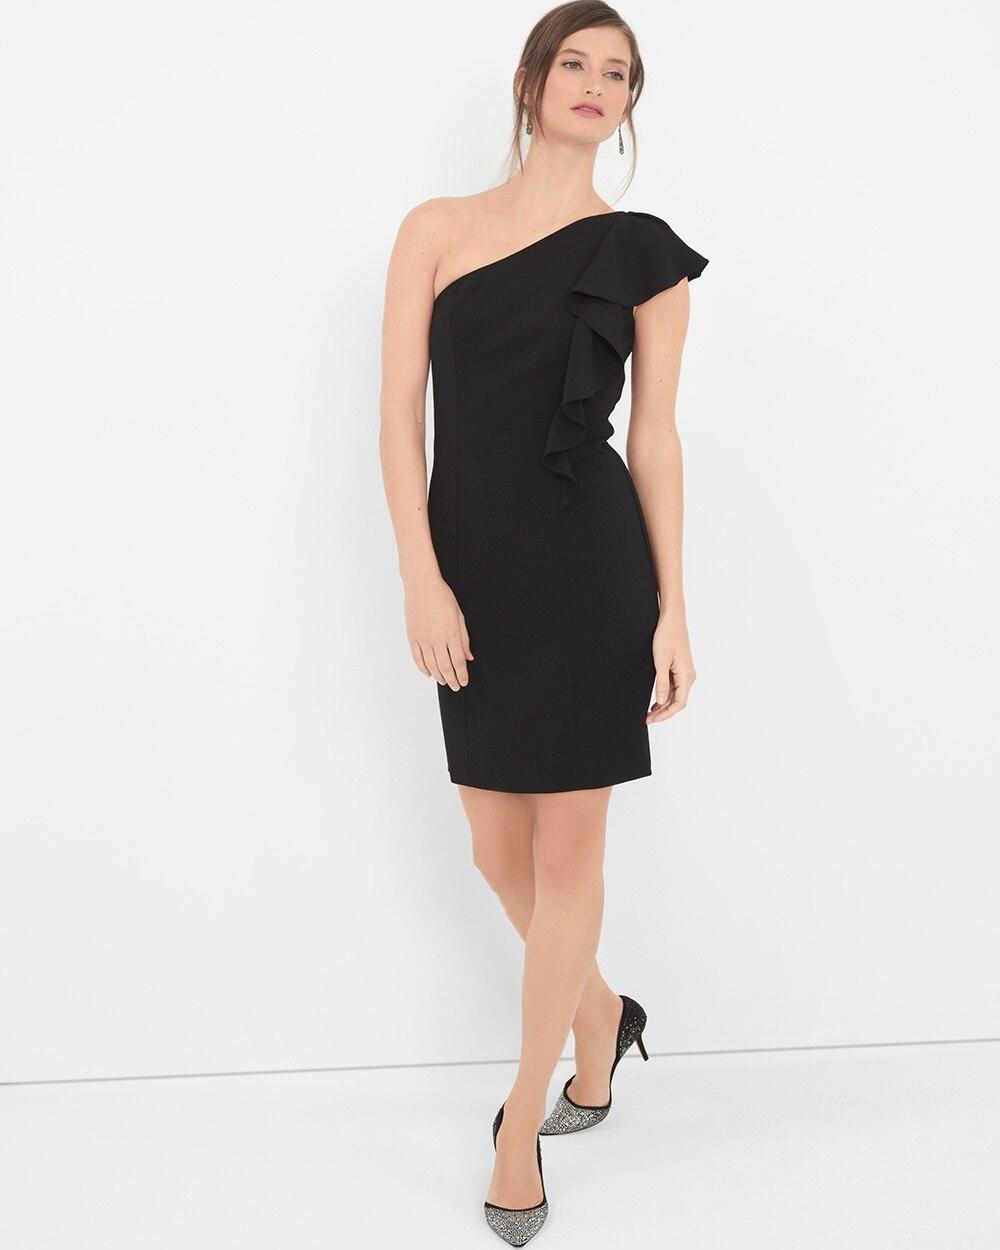 5dc5bbaa30 One-Shoulder Black Ruffle Sheath Dress - White House Black Market